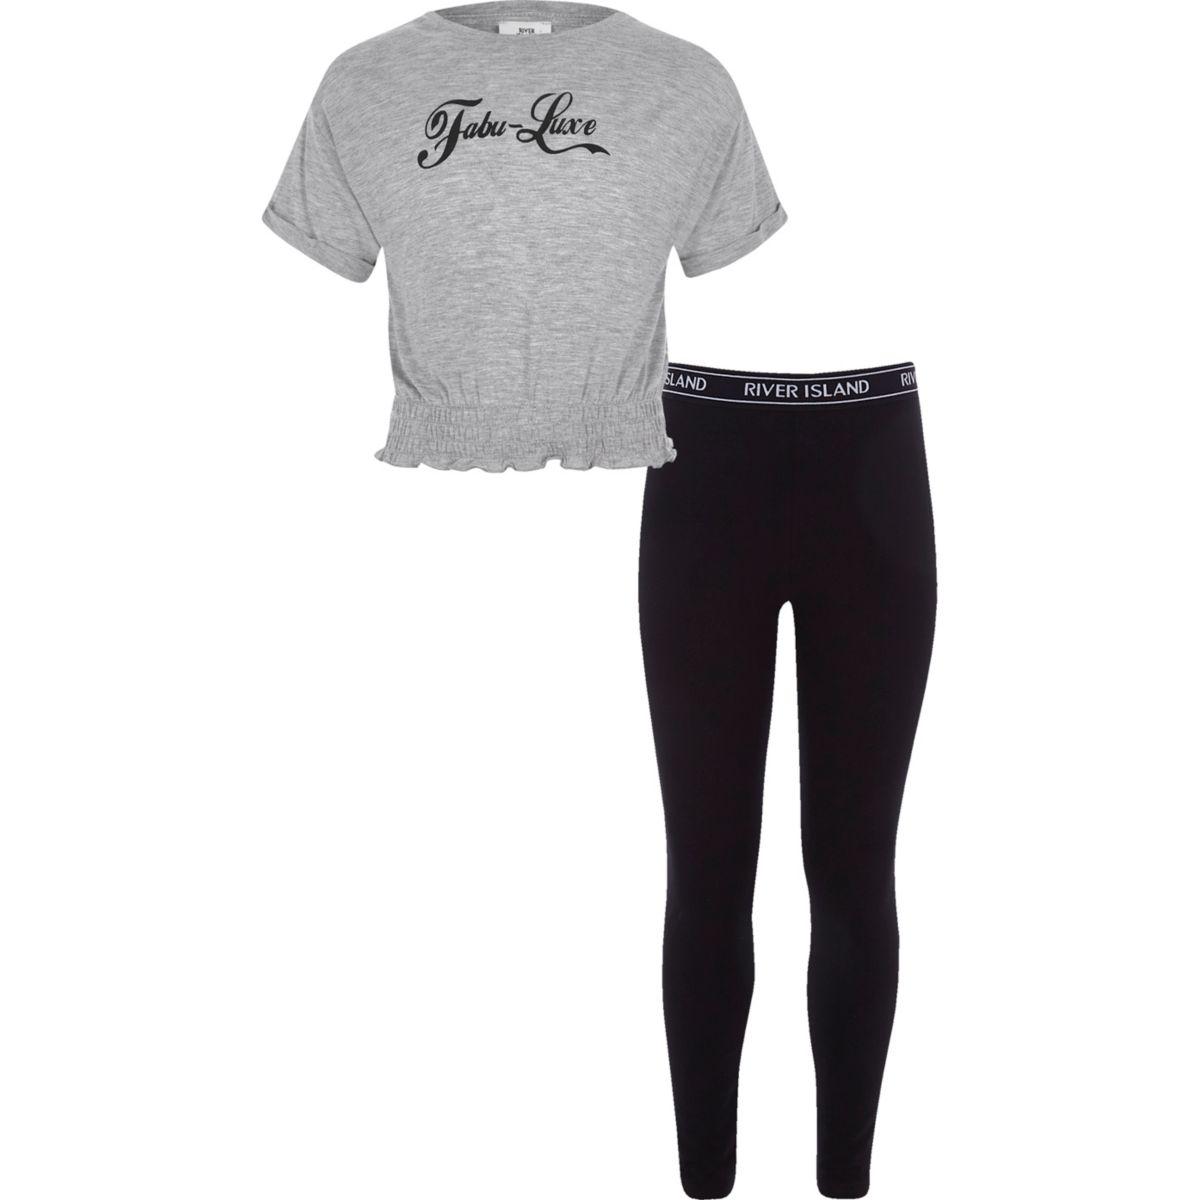 Girls grey T-shirt and RI leggings outfit